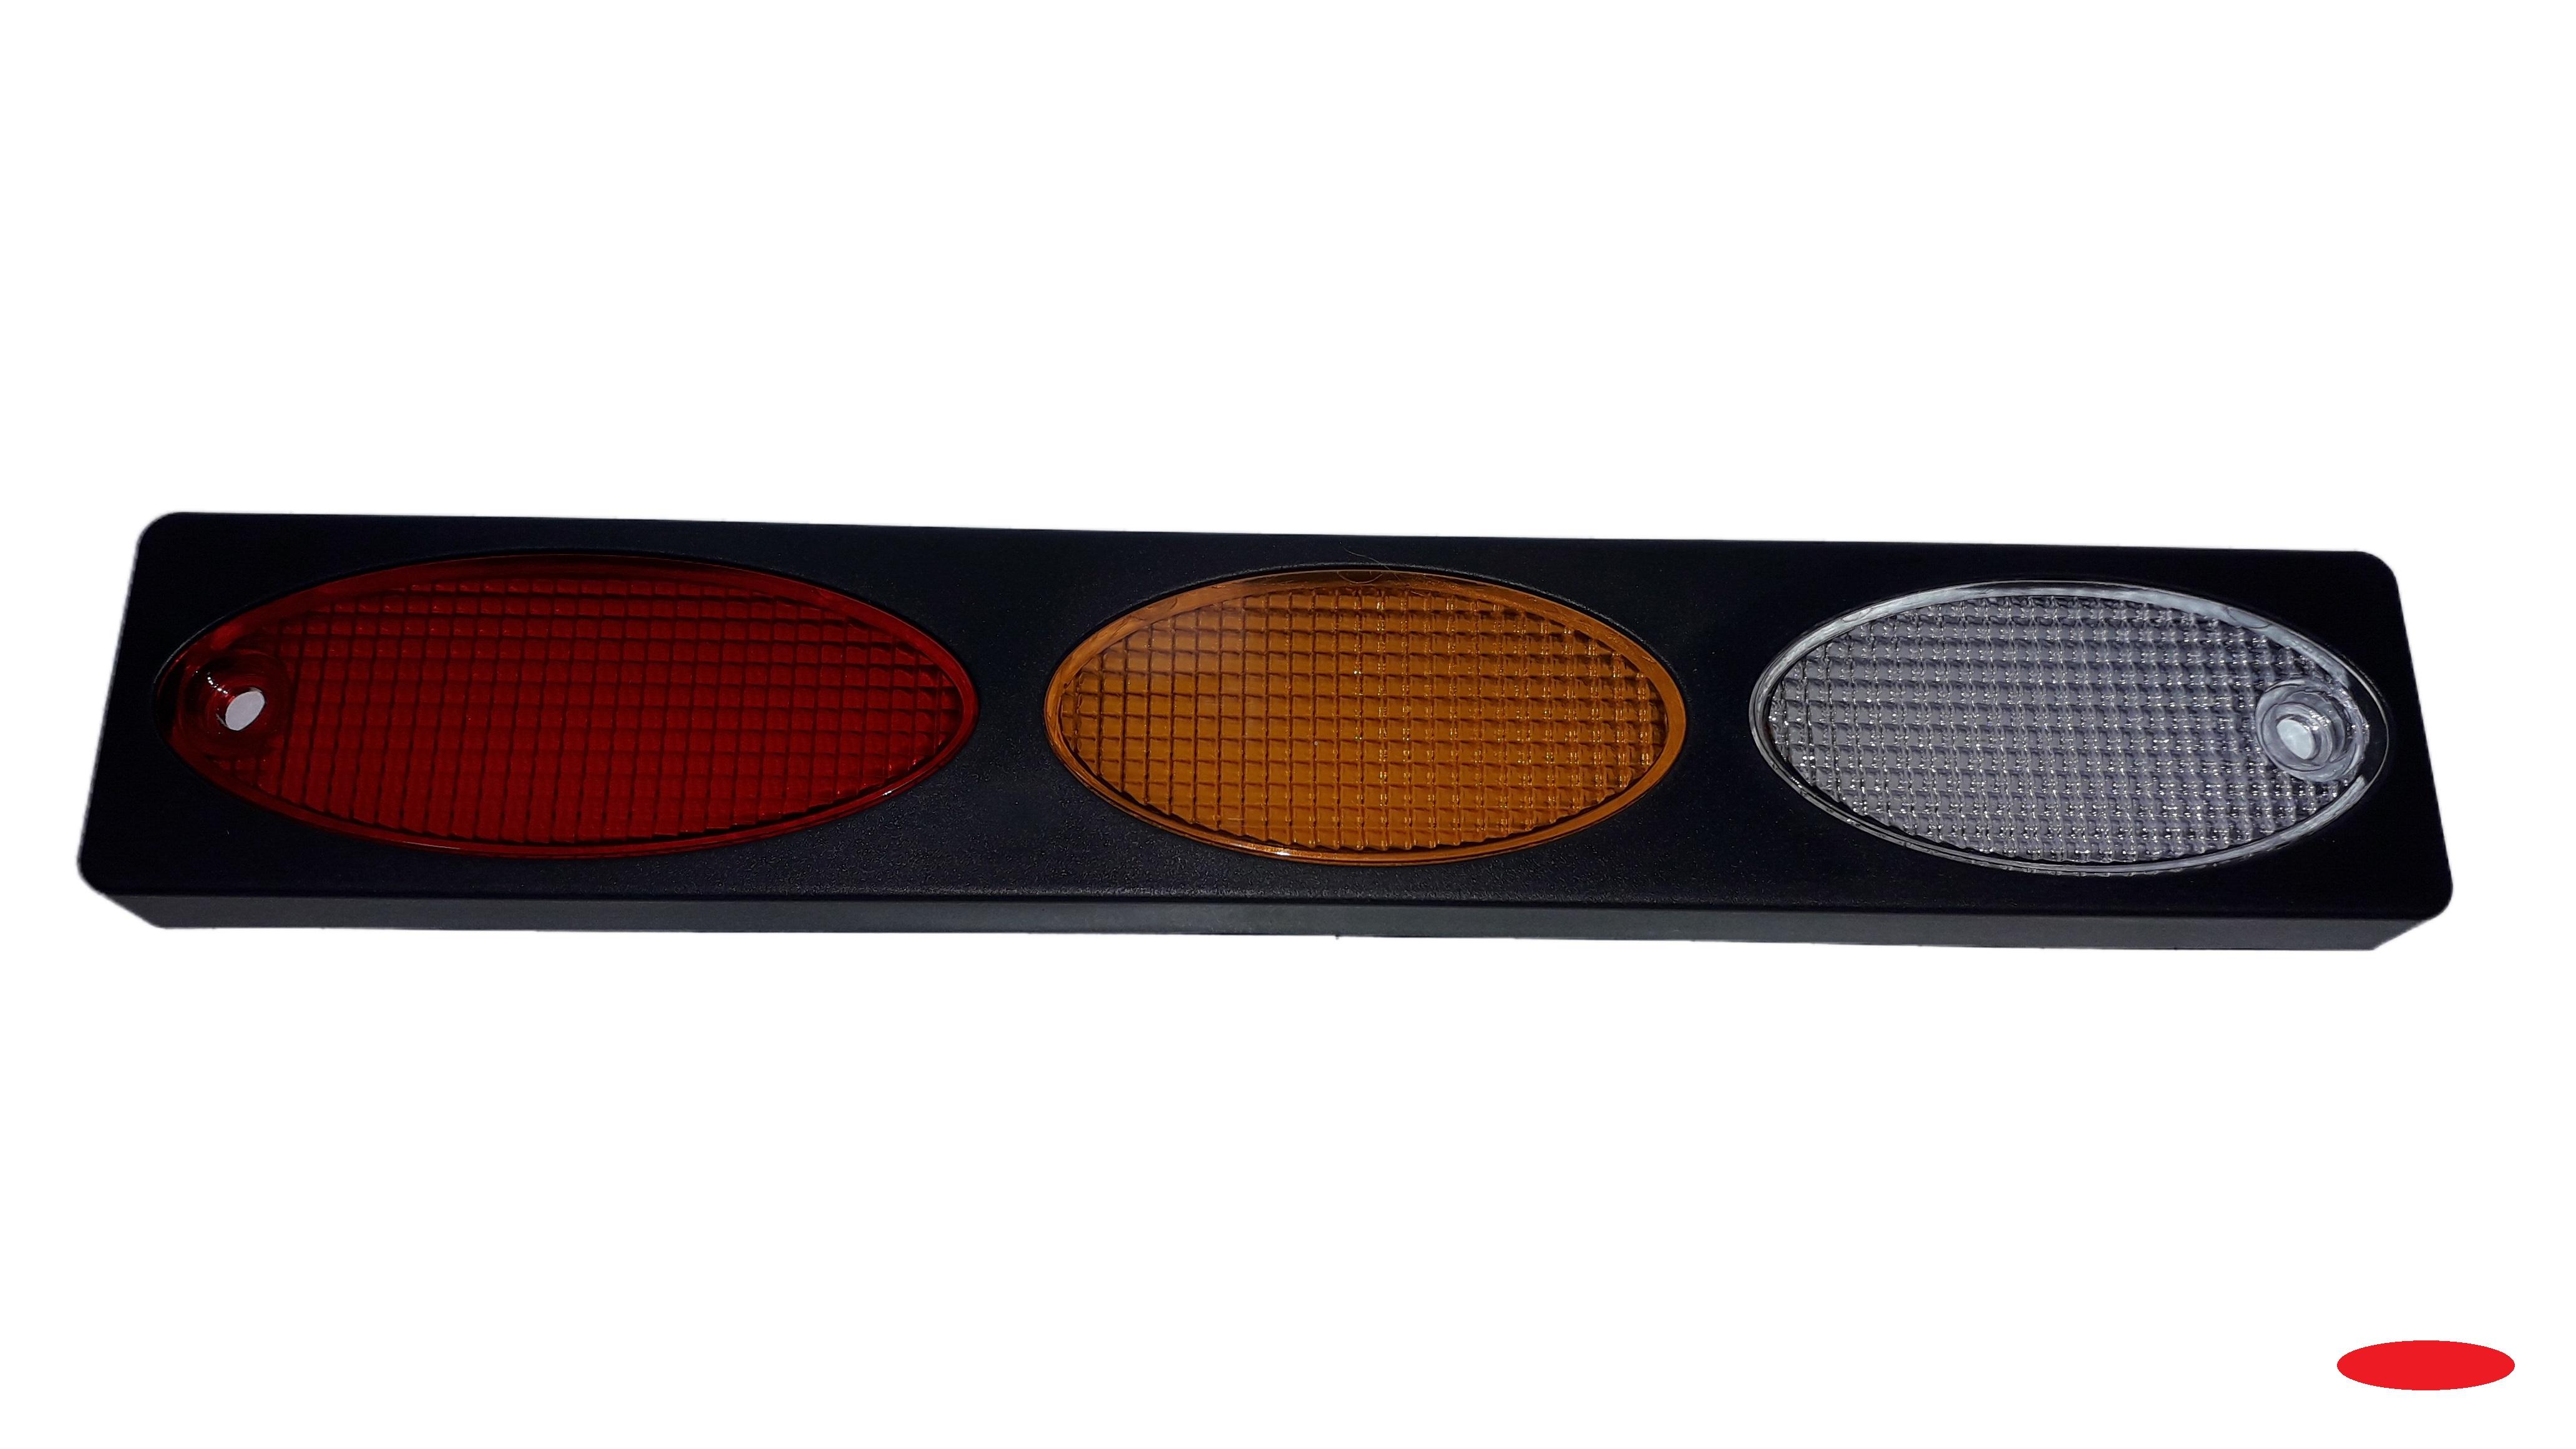 Klosz Lampy Tył Wózek Widłowy Nissan L02 D02 Lx